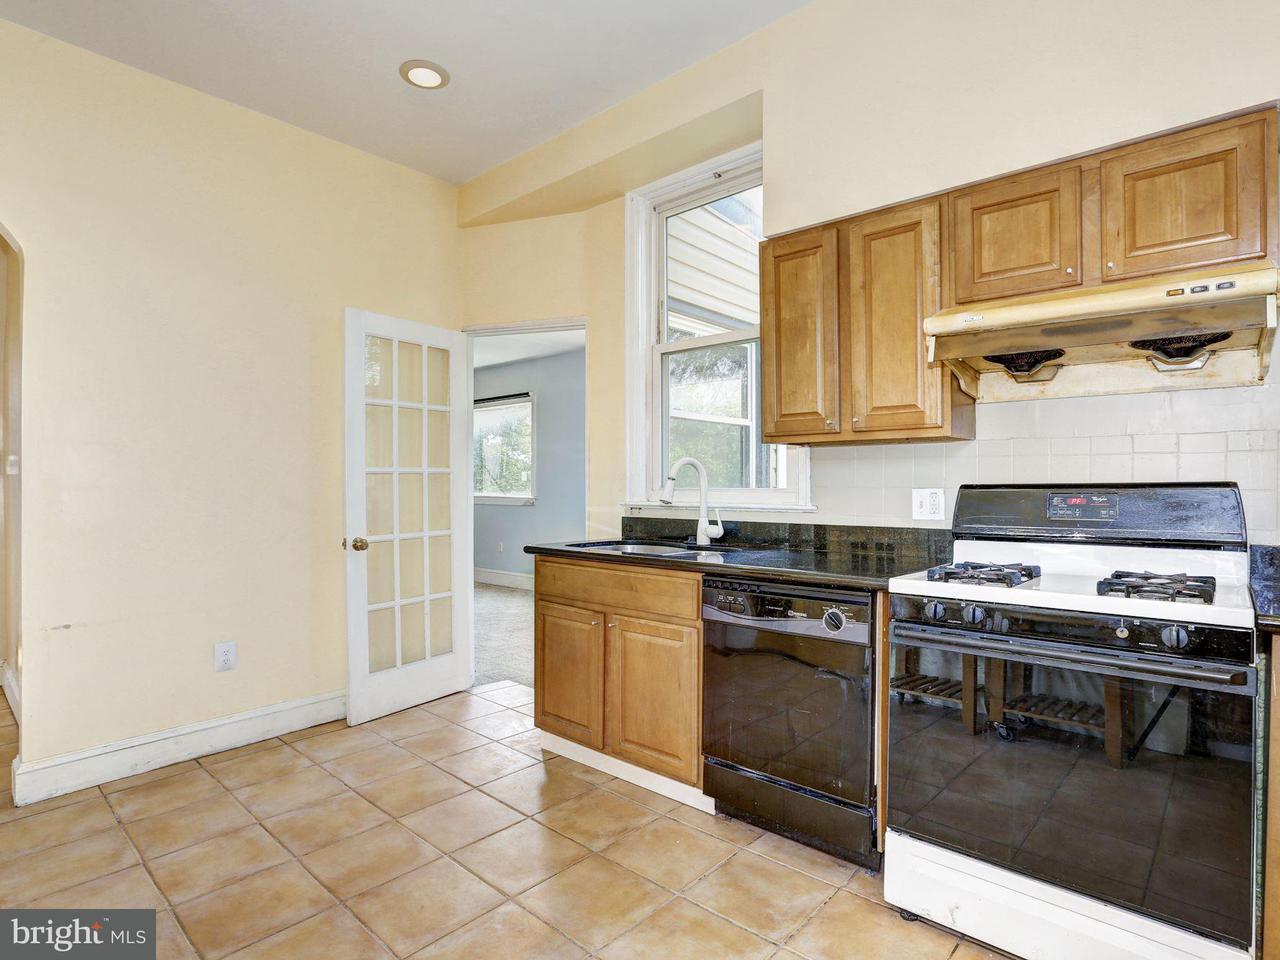 Additional photo for property listing at 4315 GALLATIN Street 4315 GALLATIN Street Hyattsville, Μεριλαντ 20781 Ηνωμενεσ Πολιτειεσ